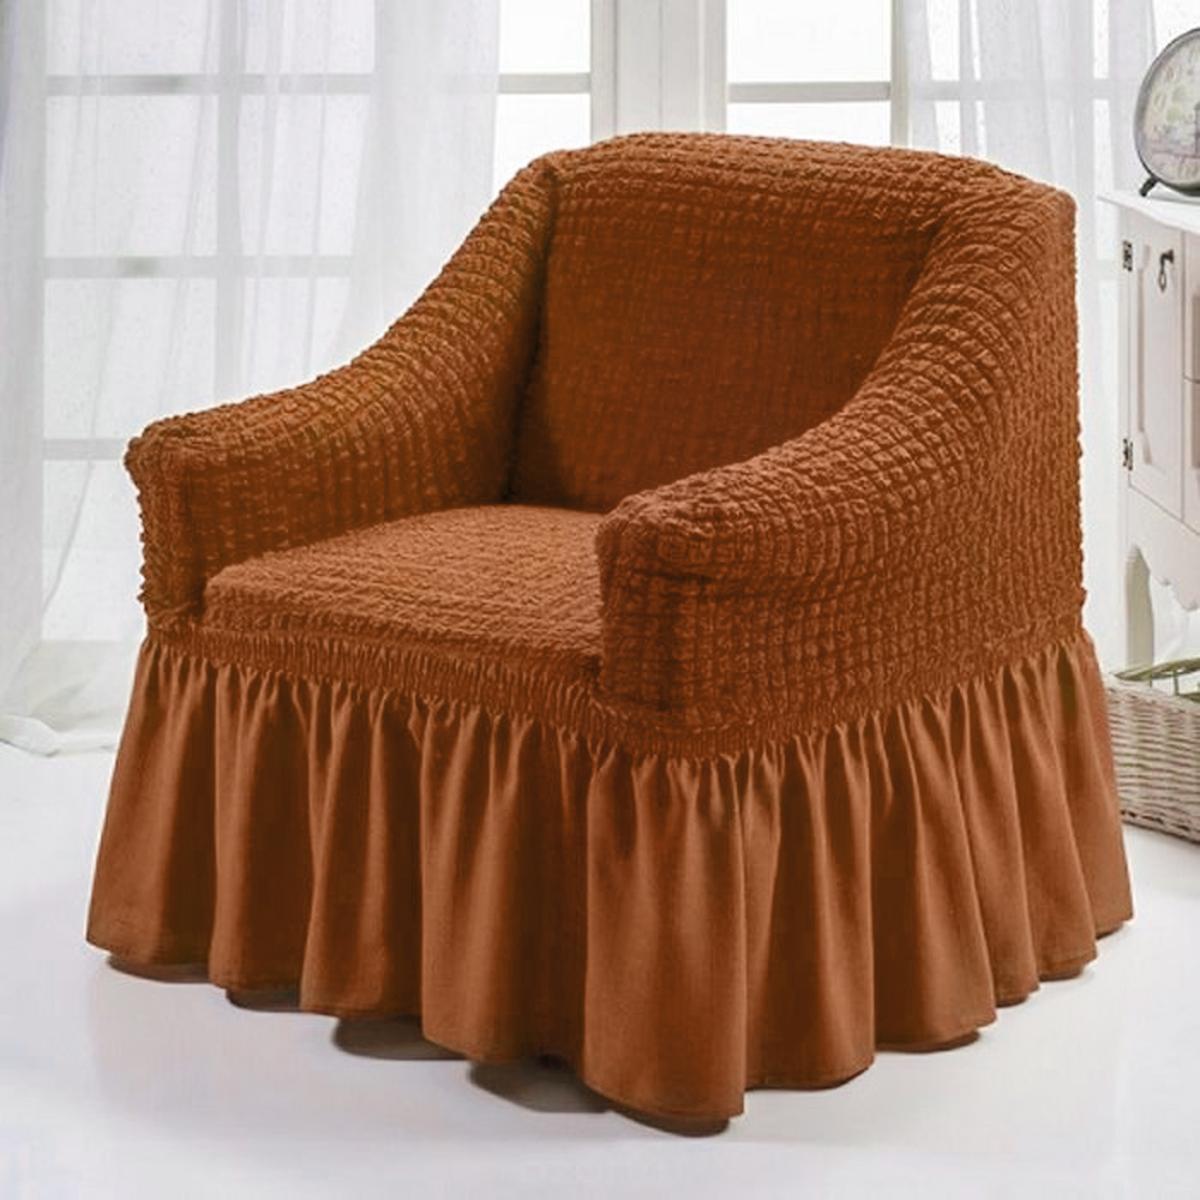 Чехол для кресла Karna Bulsan, цвет: горчичный bulsan набор чехлов для дивана bulsan цвет горчичный